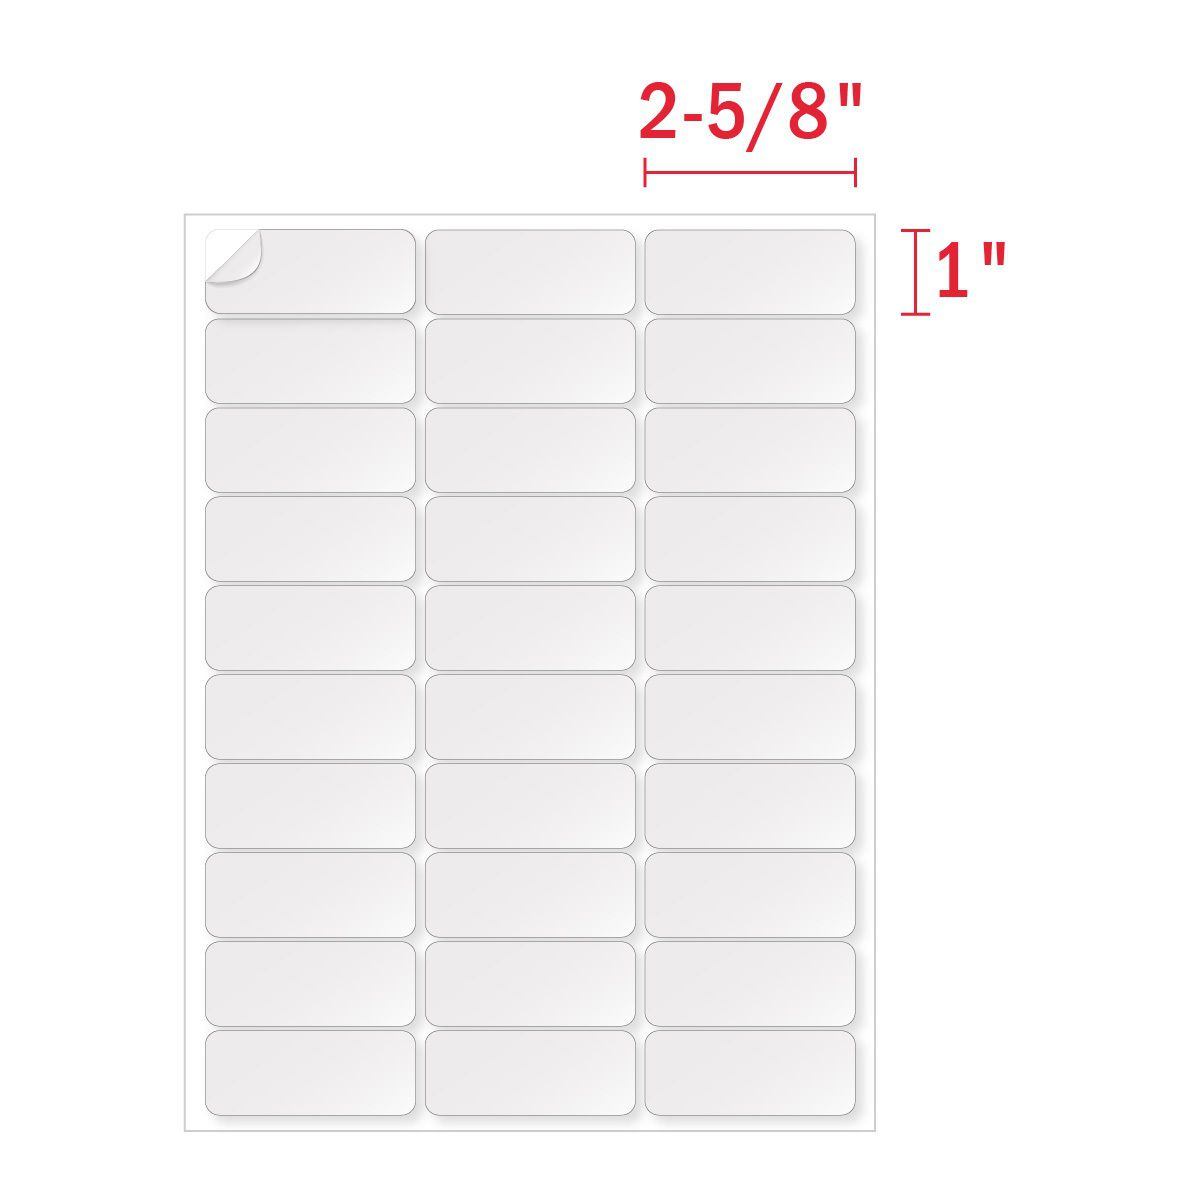 008 Frightening Microsoft Word Addres Label Template 30 Per Sheet Image Full